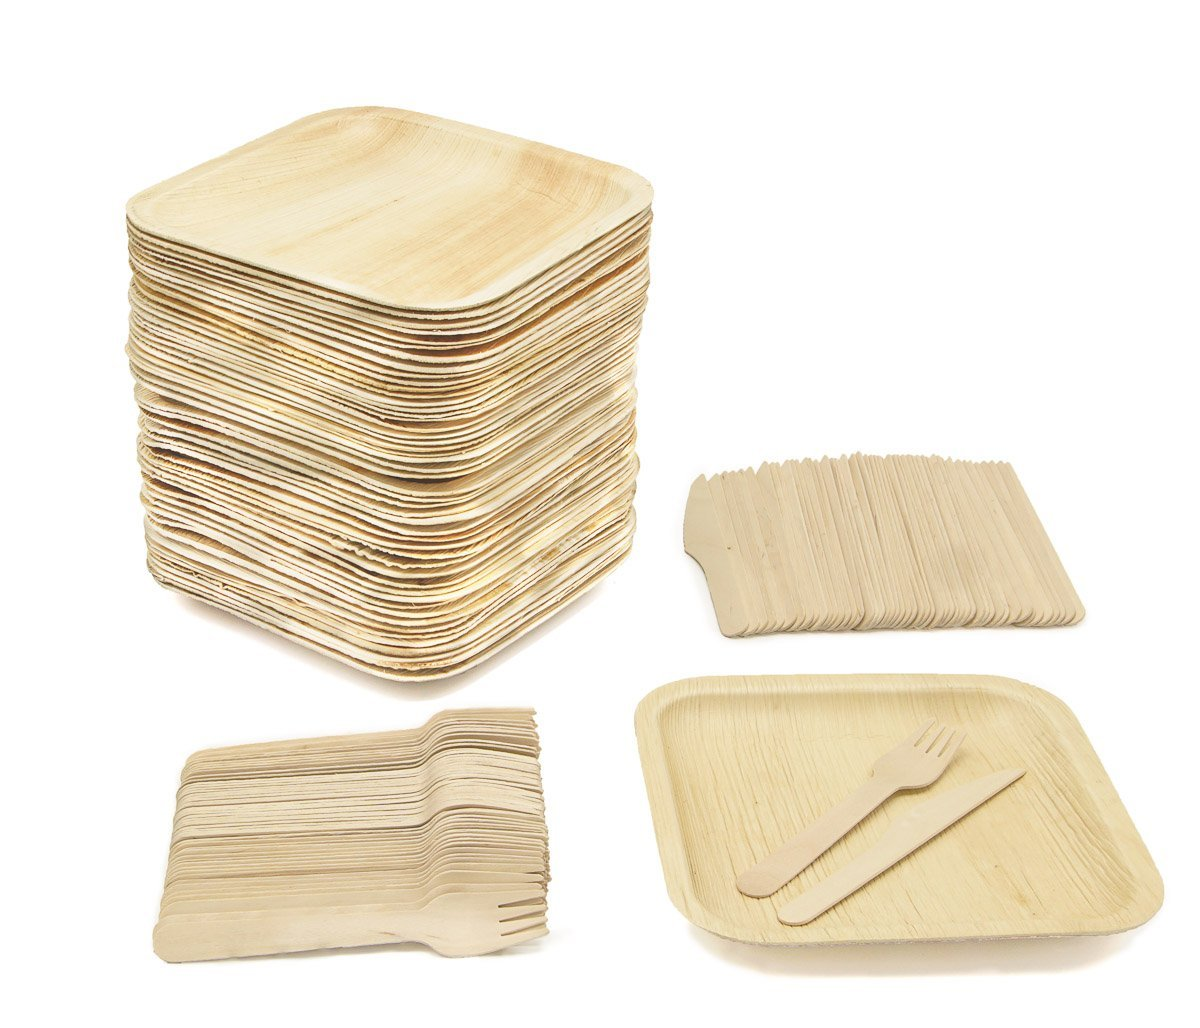 biodegradable plates, biodegradable knife, biodegradable fork